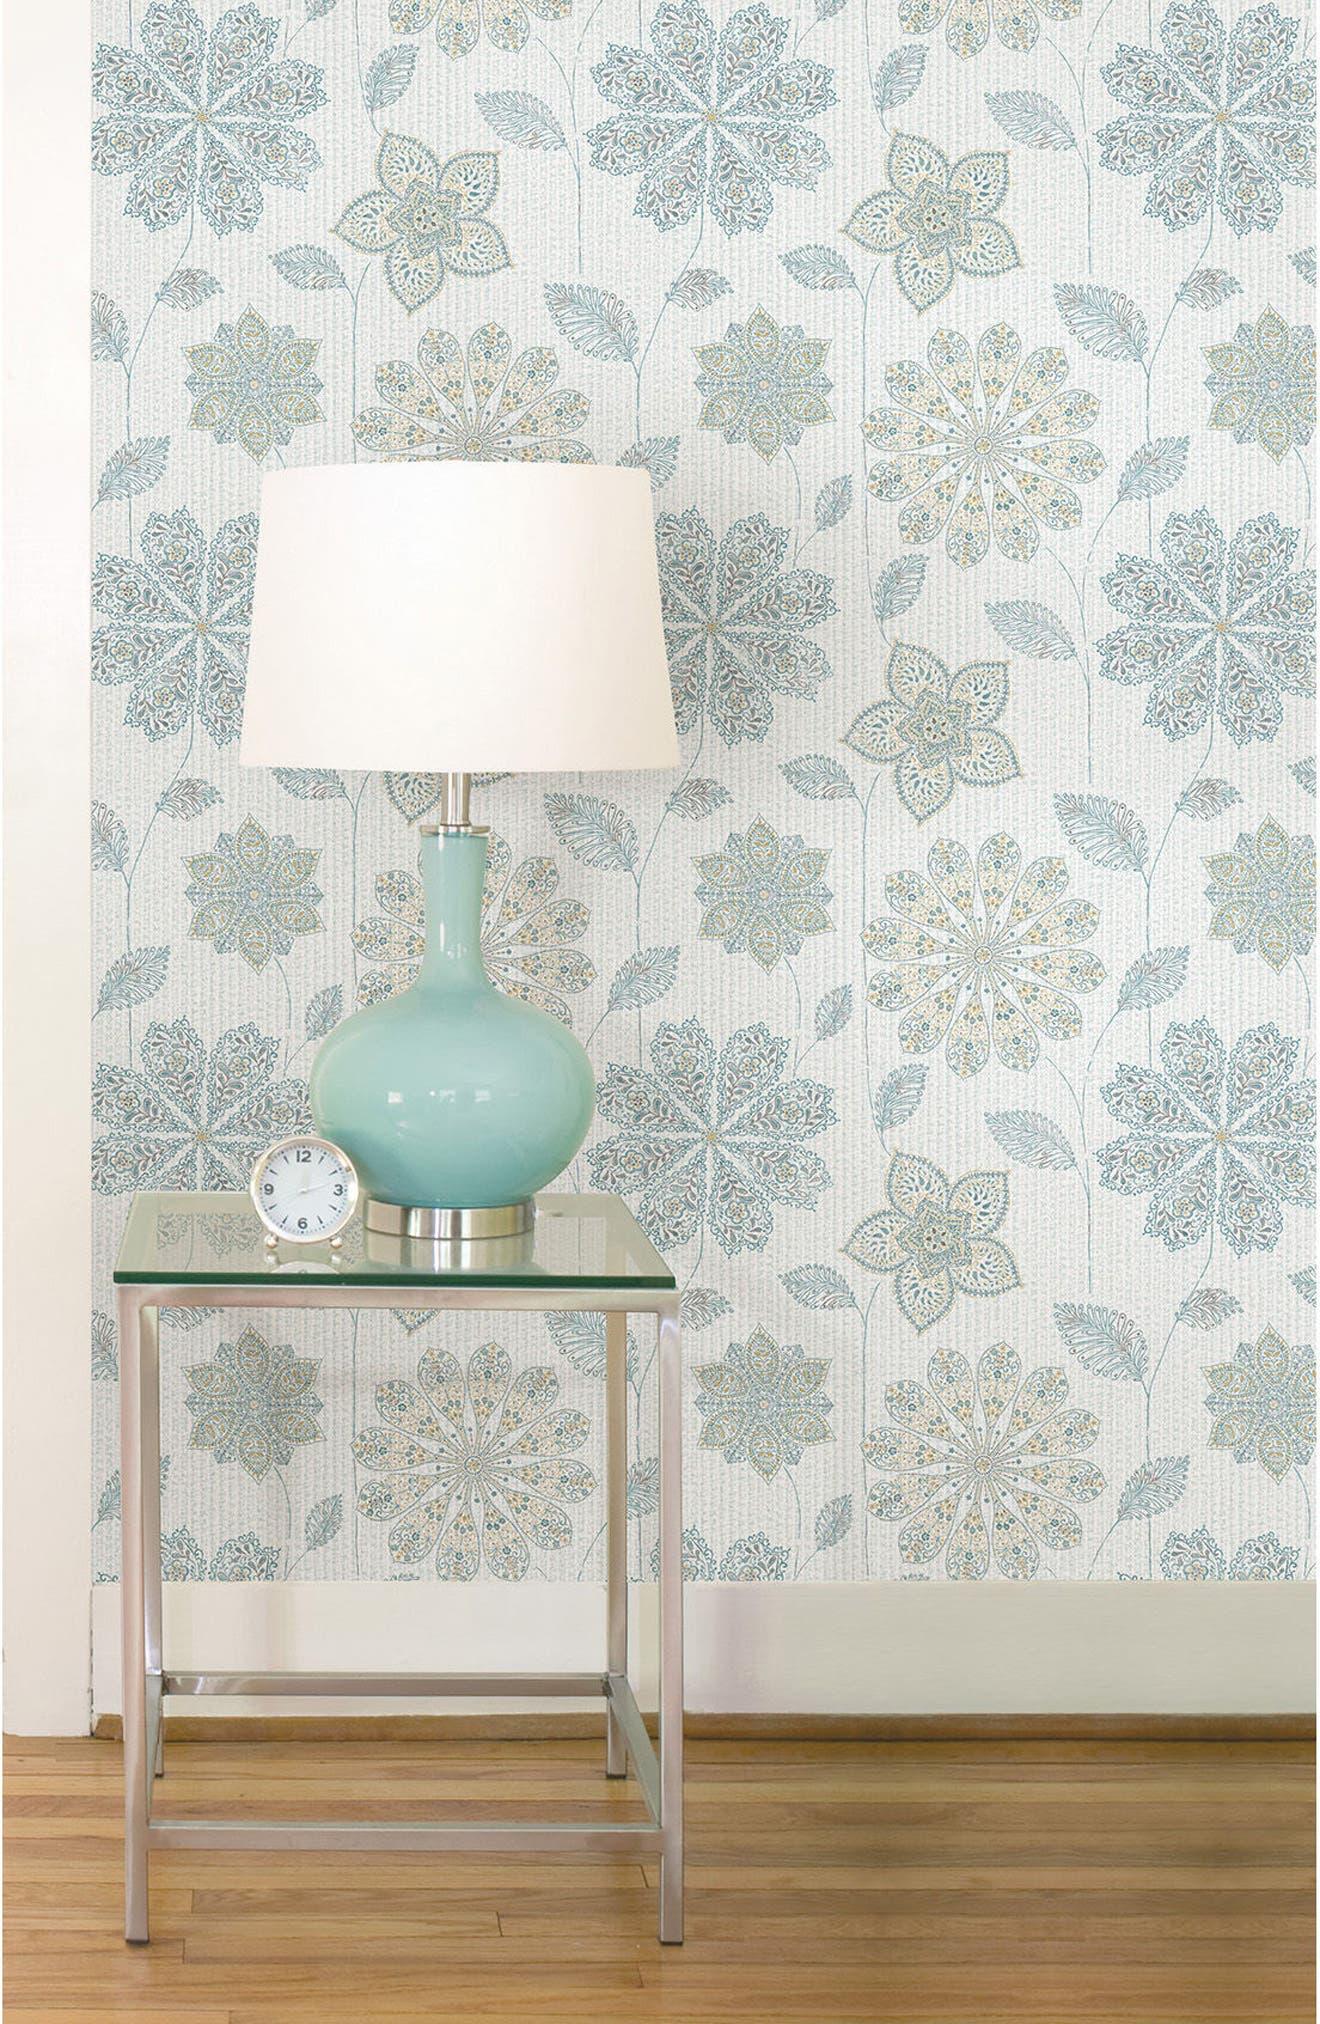 Floral Peel & Stick Vinyl Wallpaper,                             Alternate thumbnail 2, color,                             Blue